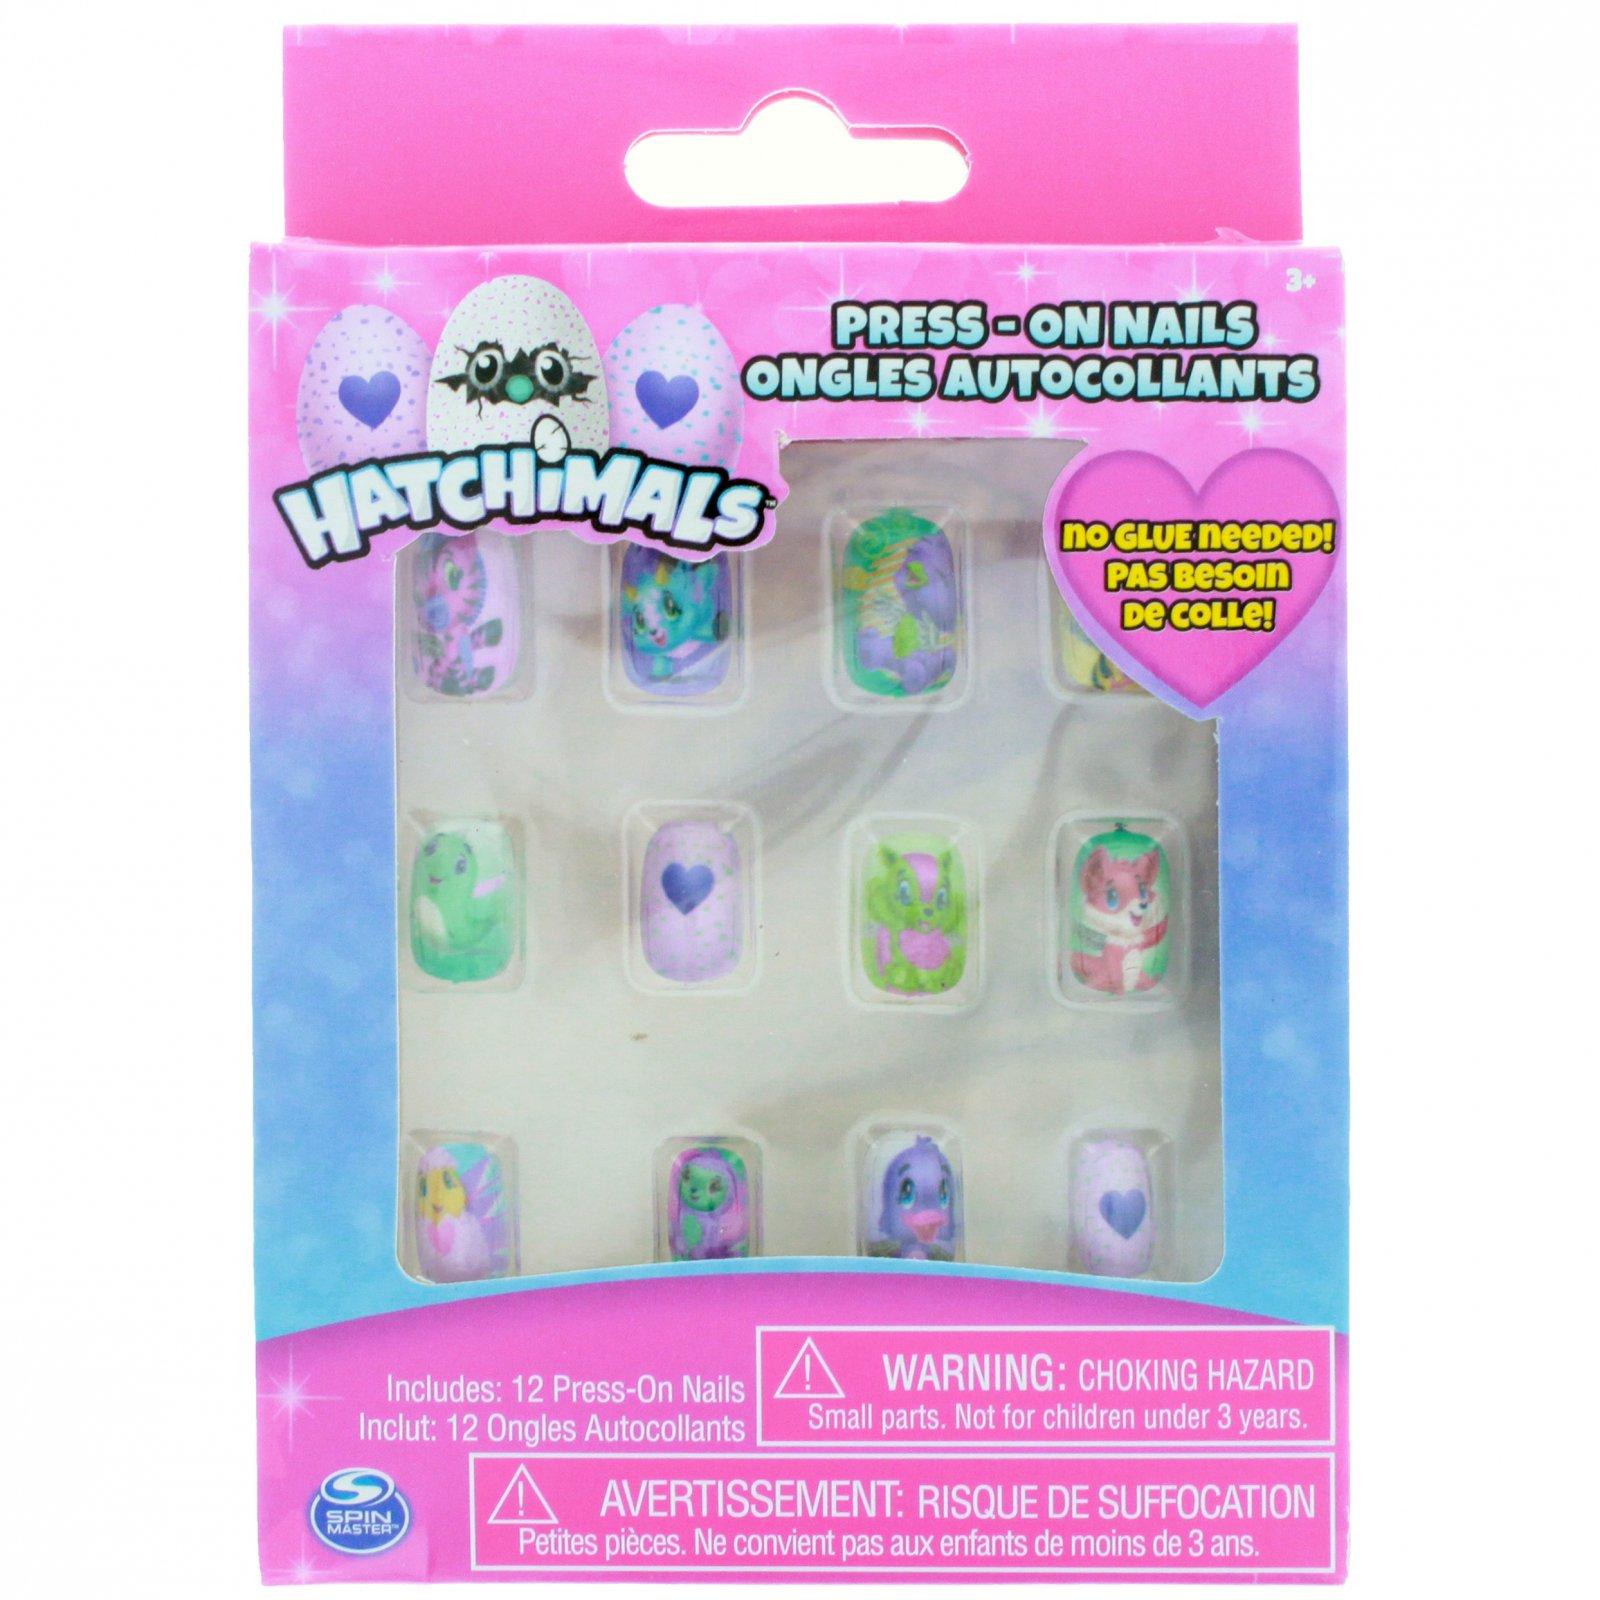 Hatchimals Multiple Design 12PC Press-On Nails